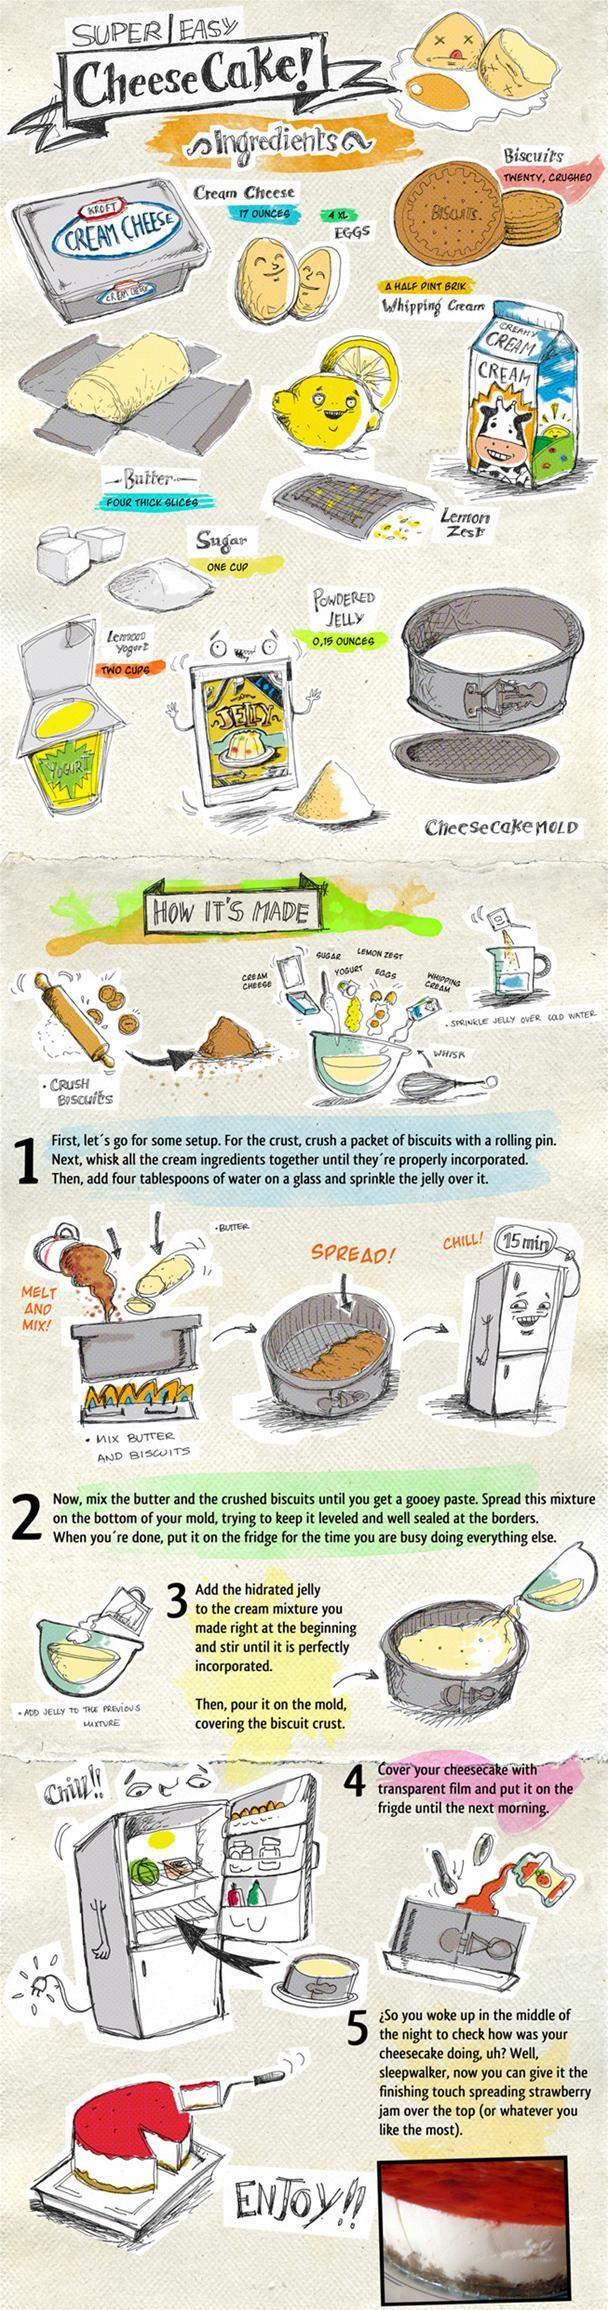 Super Easy Cheese Cake!